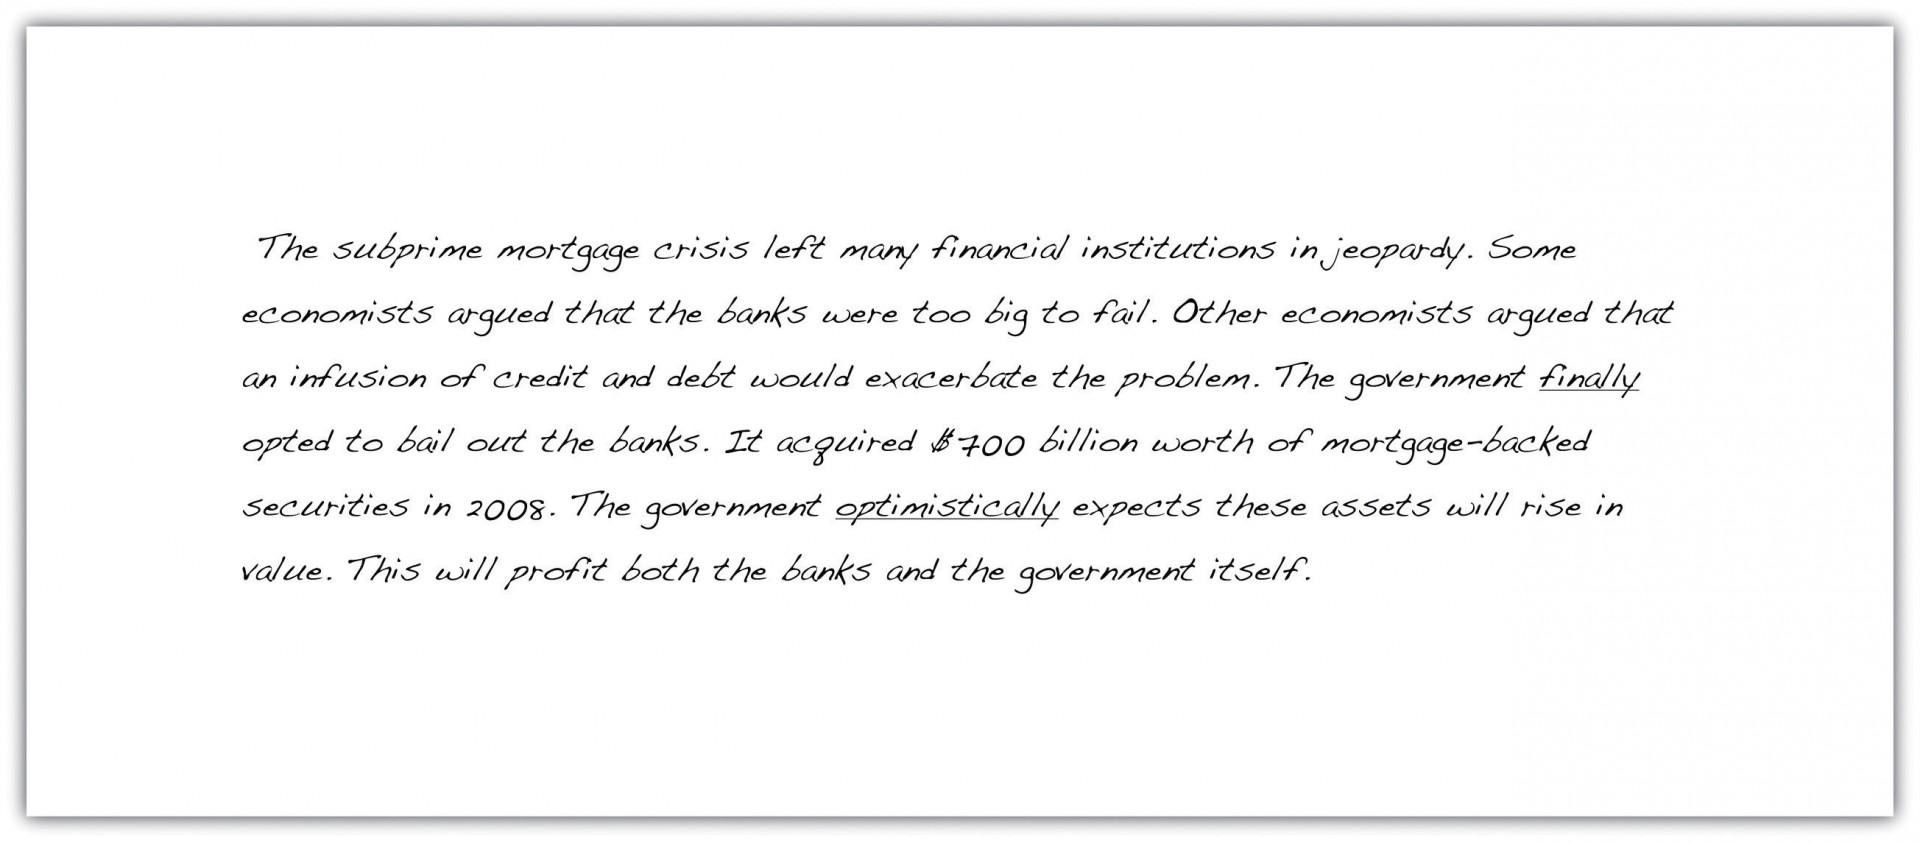 009 Essay Rewriter Example Singular Free Software Crack Generator 1920